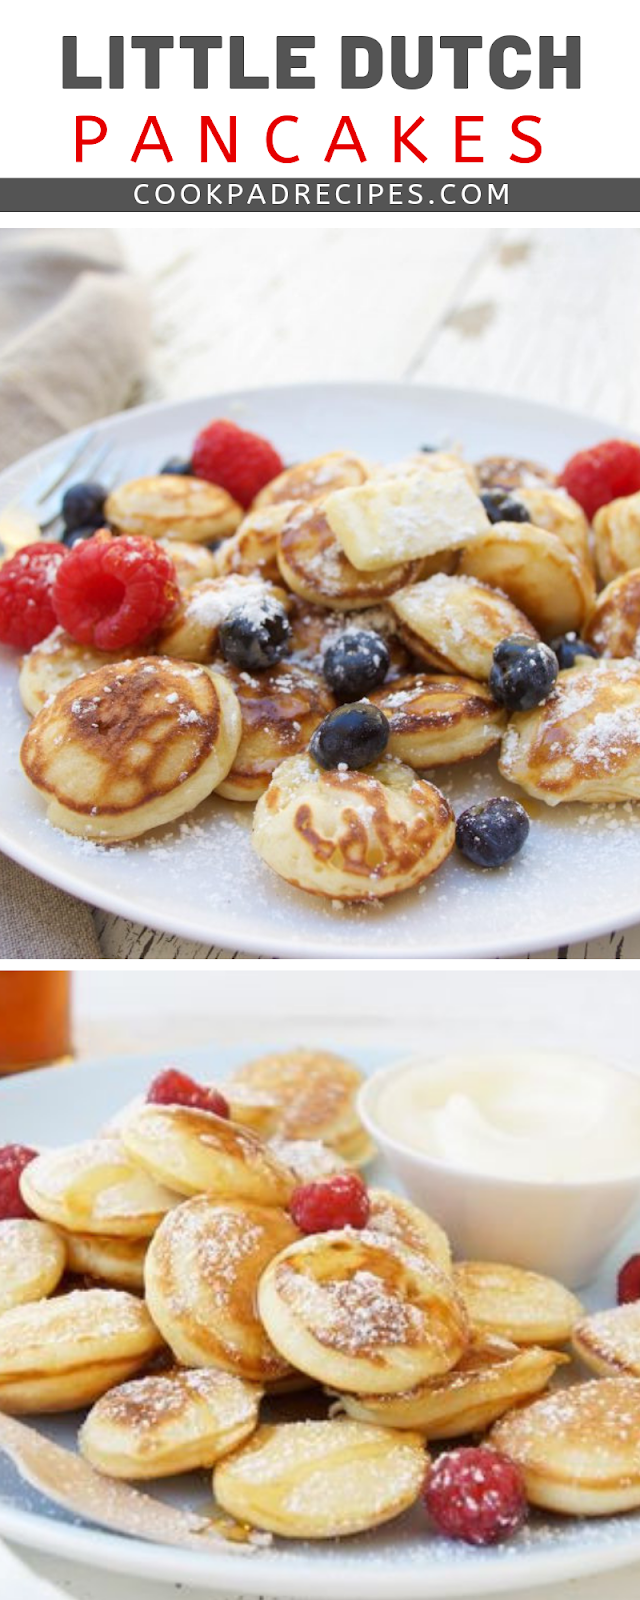 Lіttlе Dutсh Pancakes